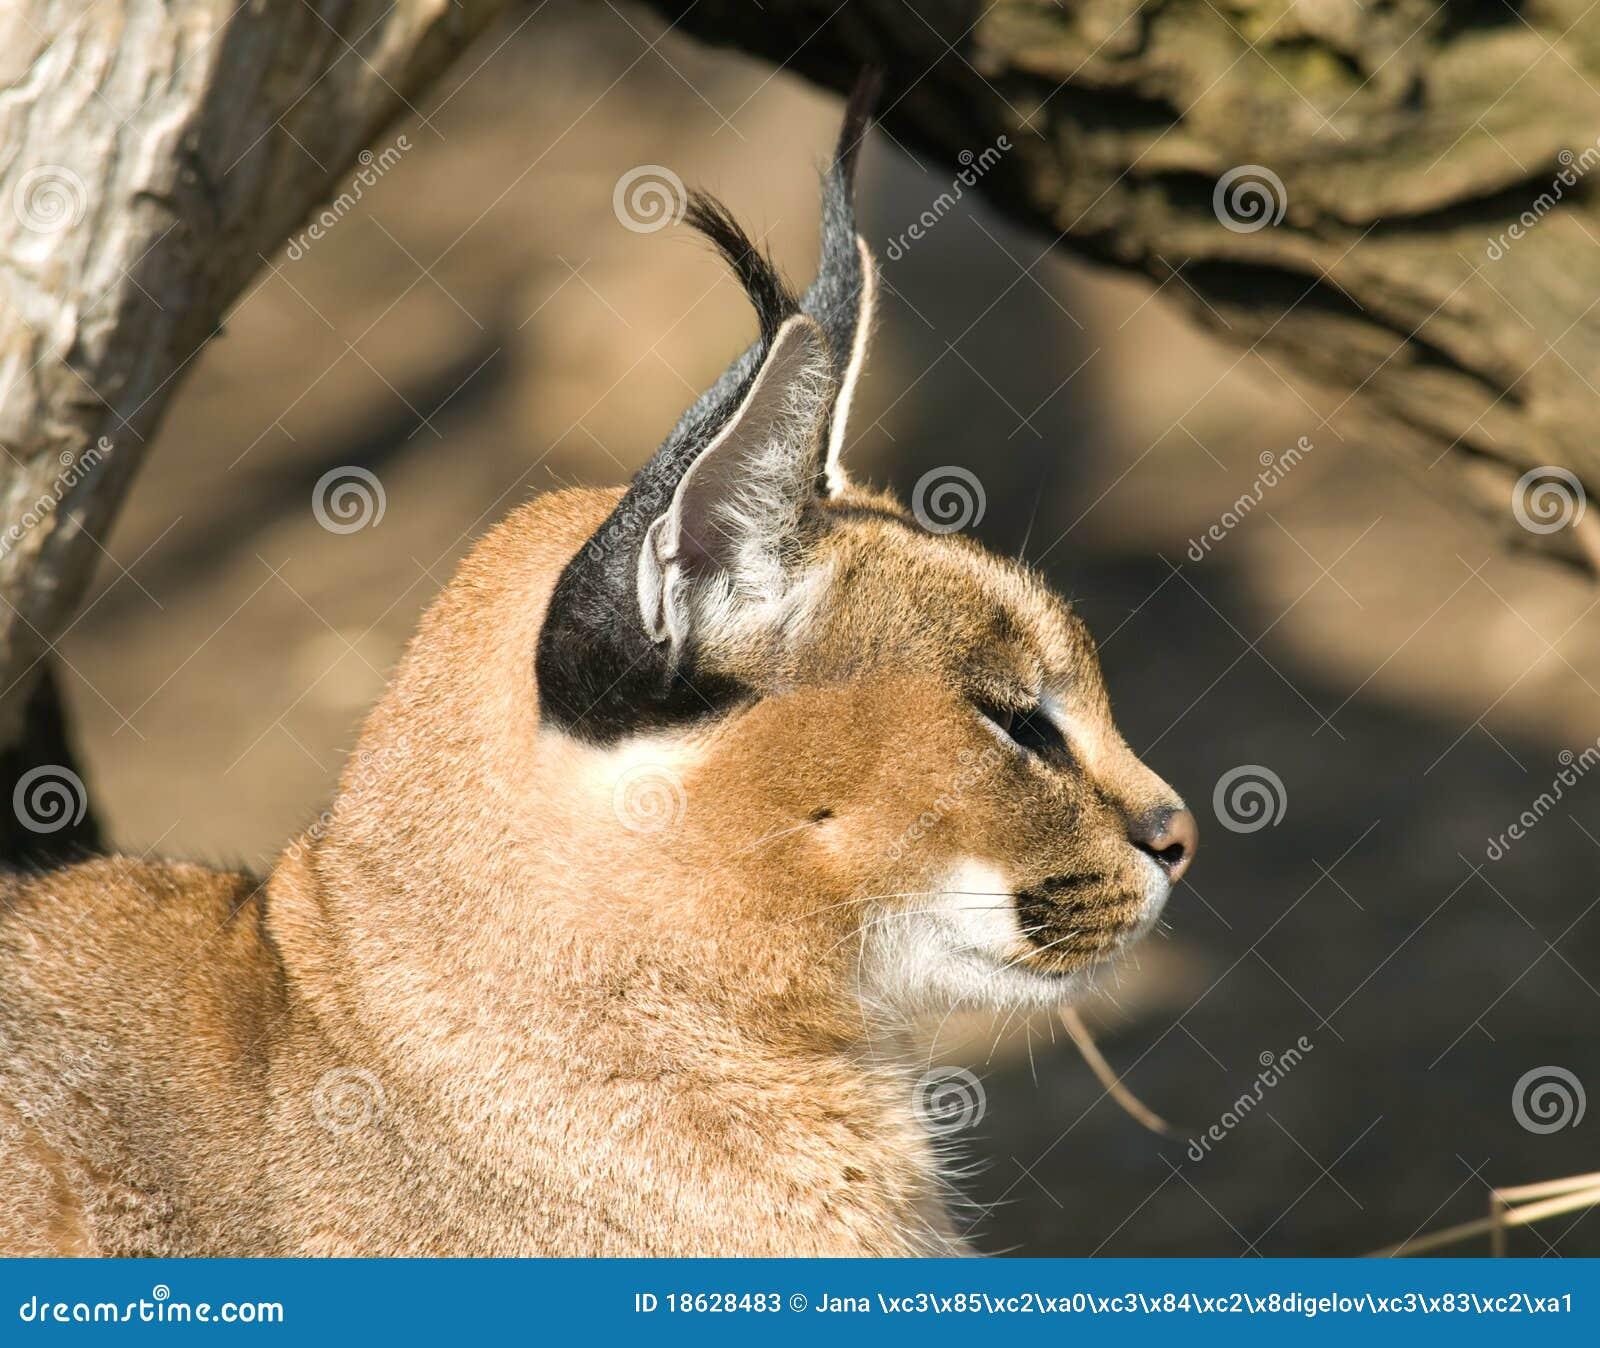 Desert Lynx Caracal Caracal Stock Image Image Of Wildlife Lynx